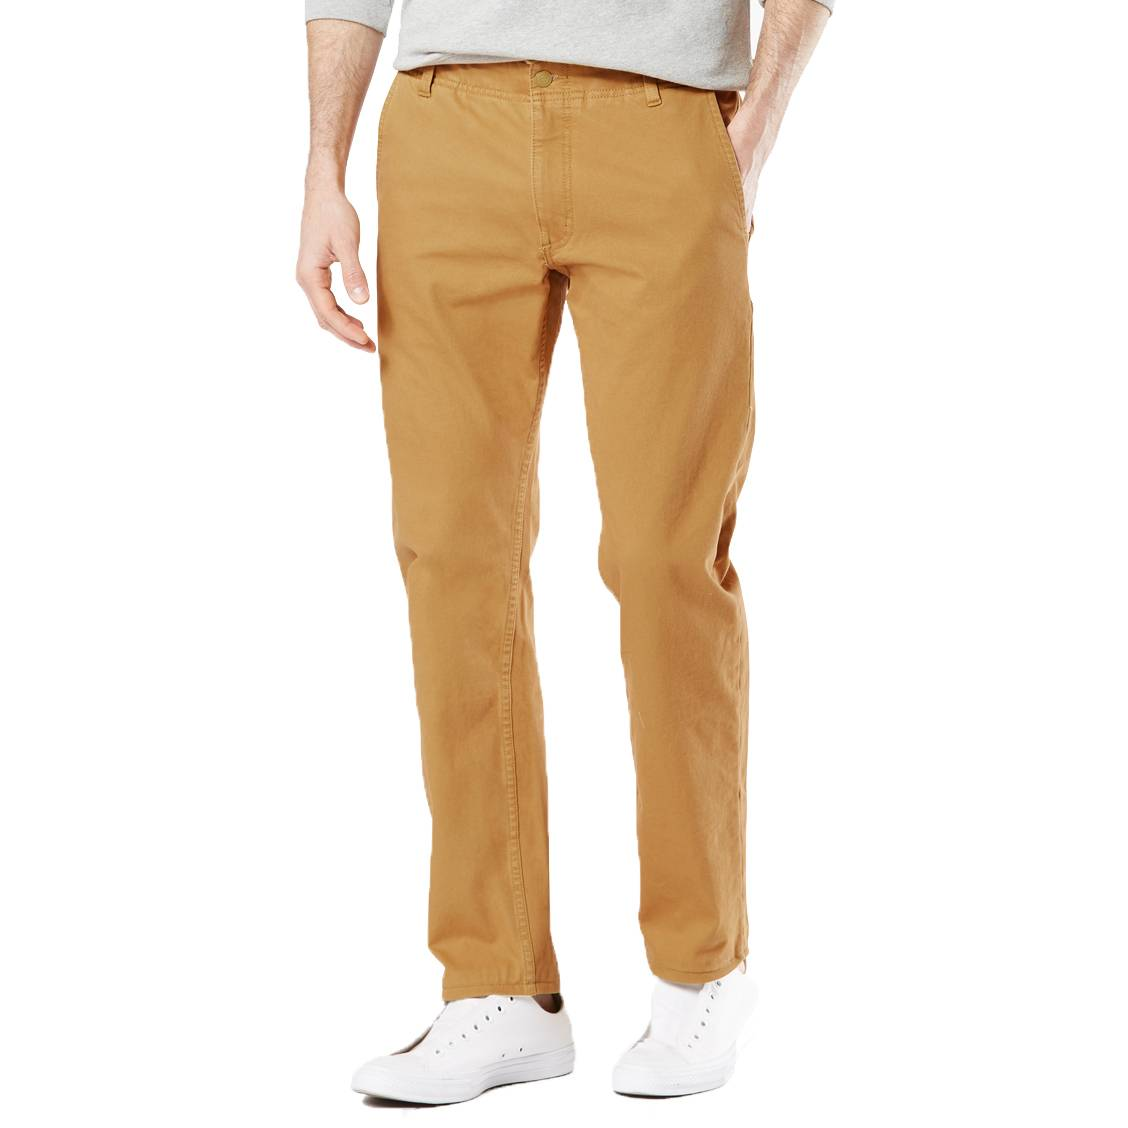 Pantalon  alpha khaki en coton stretch jaune moutarde